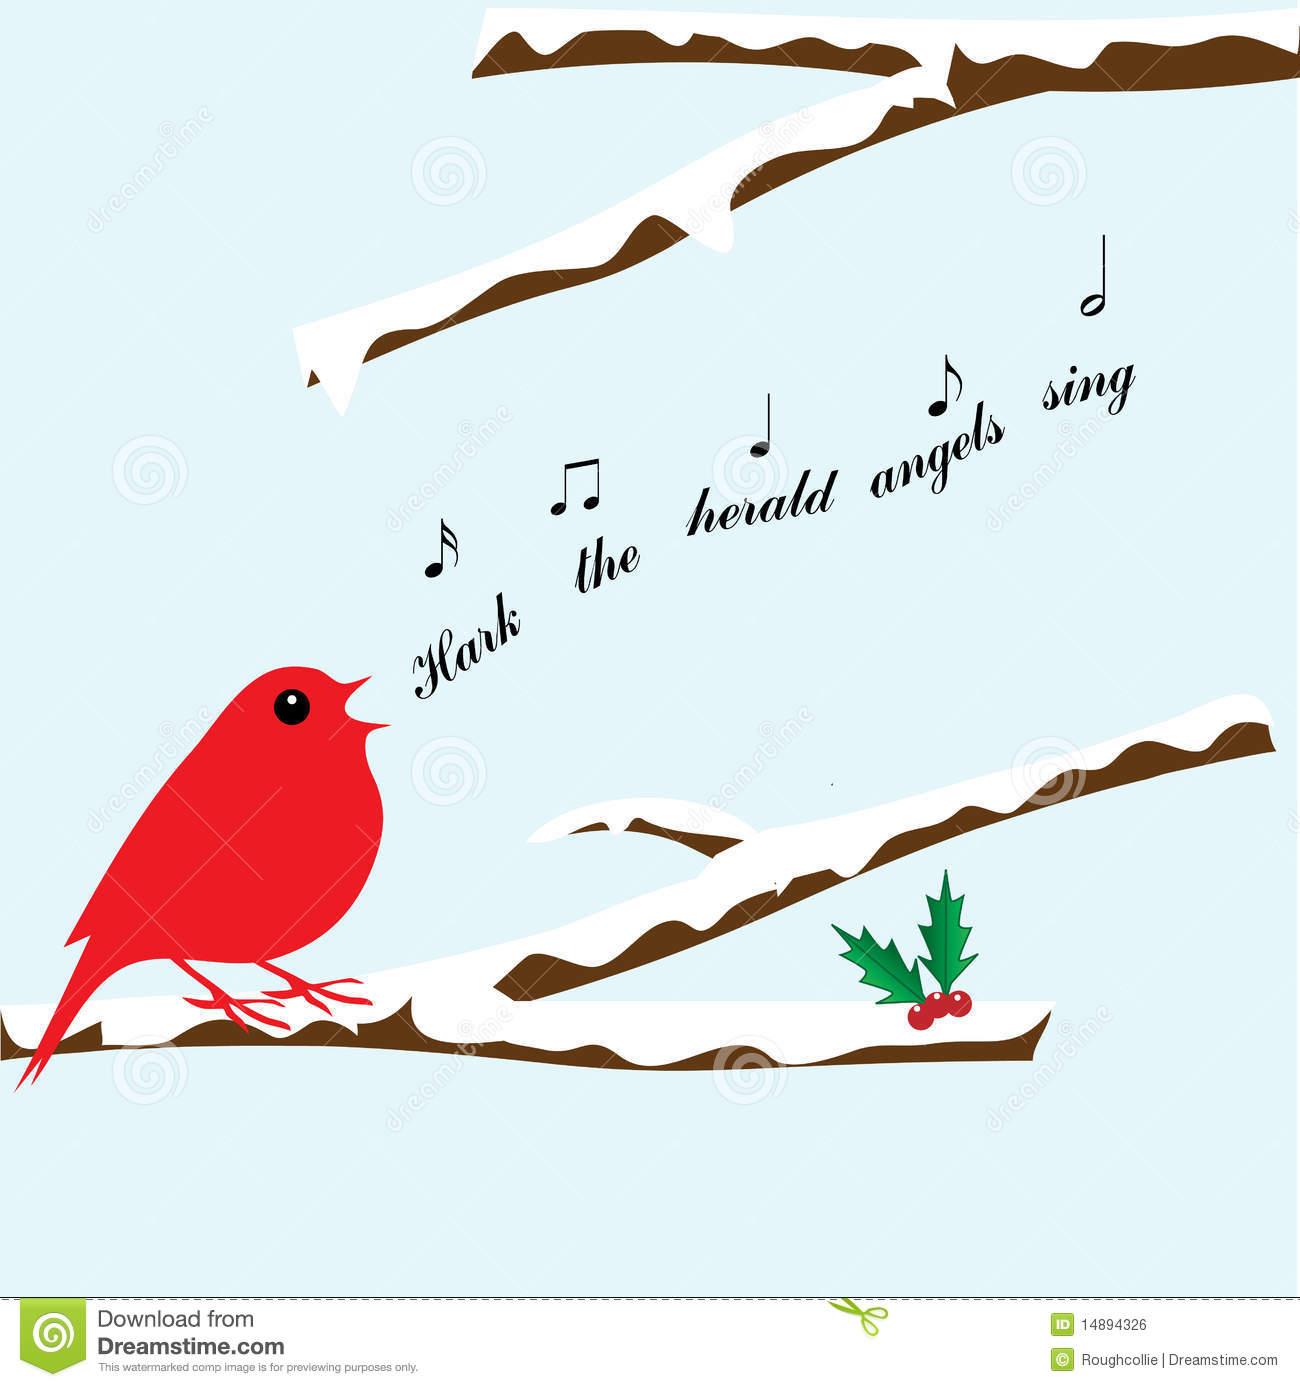 ... -tree-singing-hark-the-herald-angels-sing-clipart-YikaZu-clipart.jpg